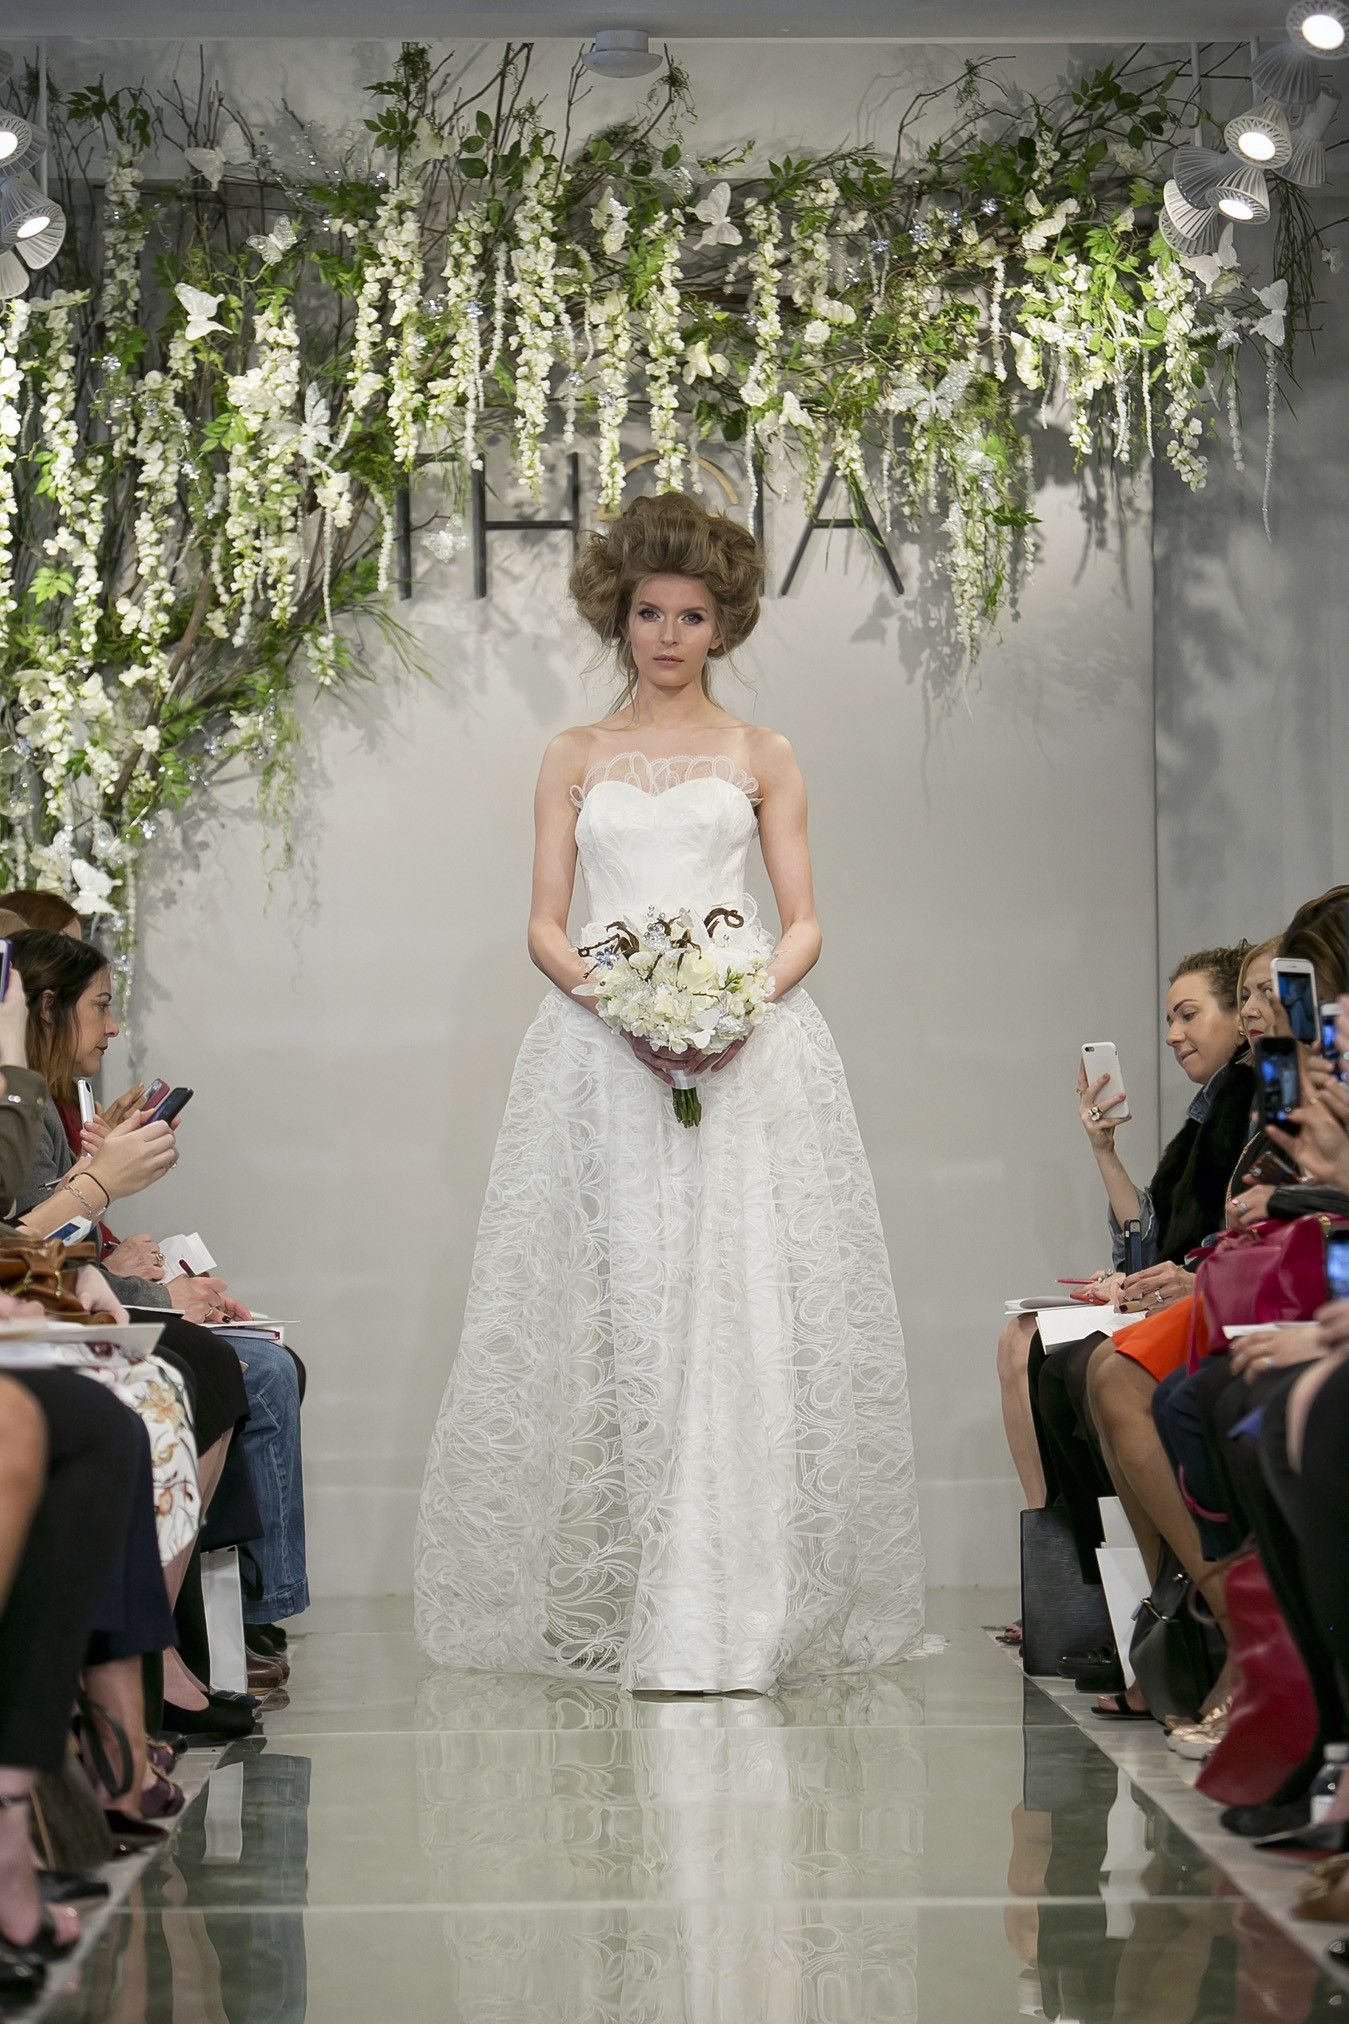 Khloe kardashian wedding dress  Althea u THEIA  Wedding stuff  Pinterest  Wedding stuff Wedding